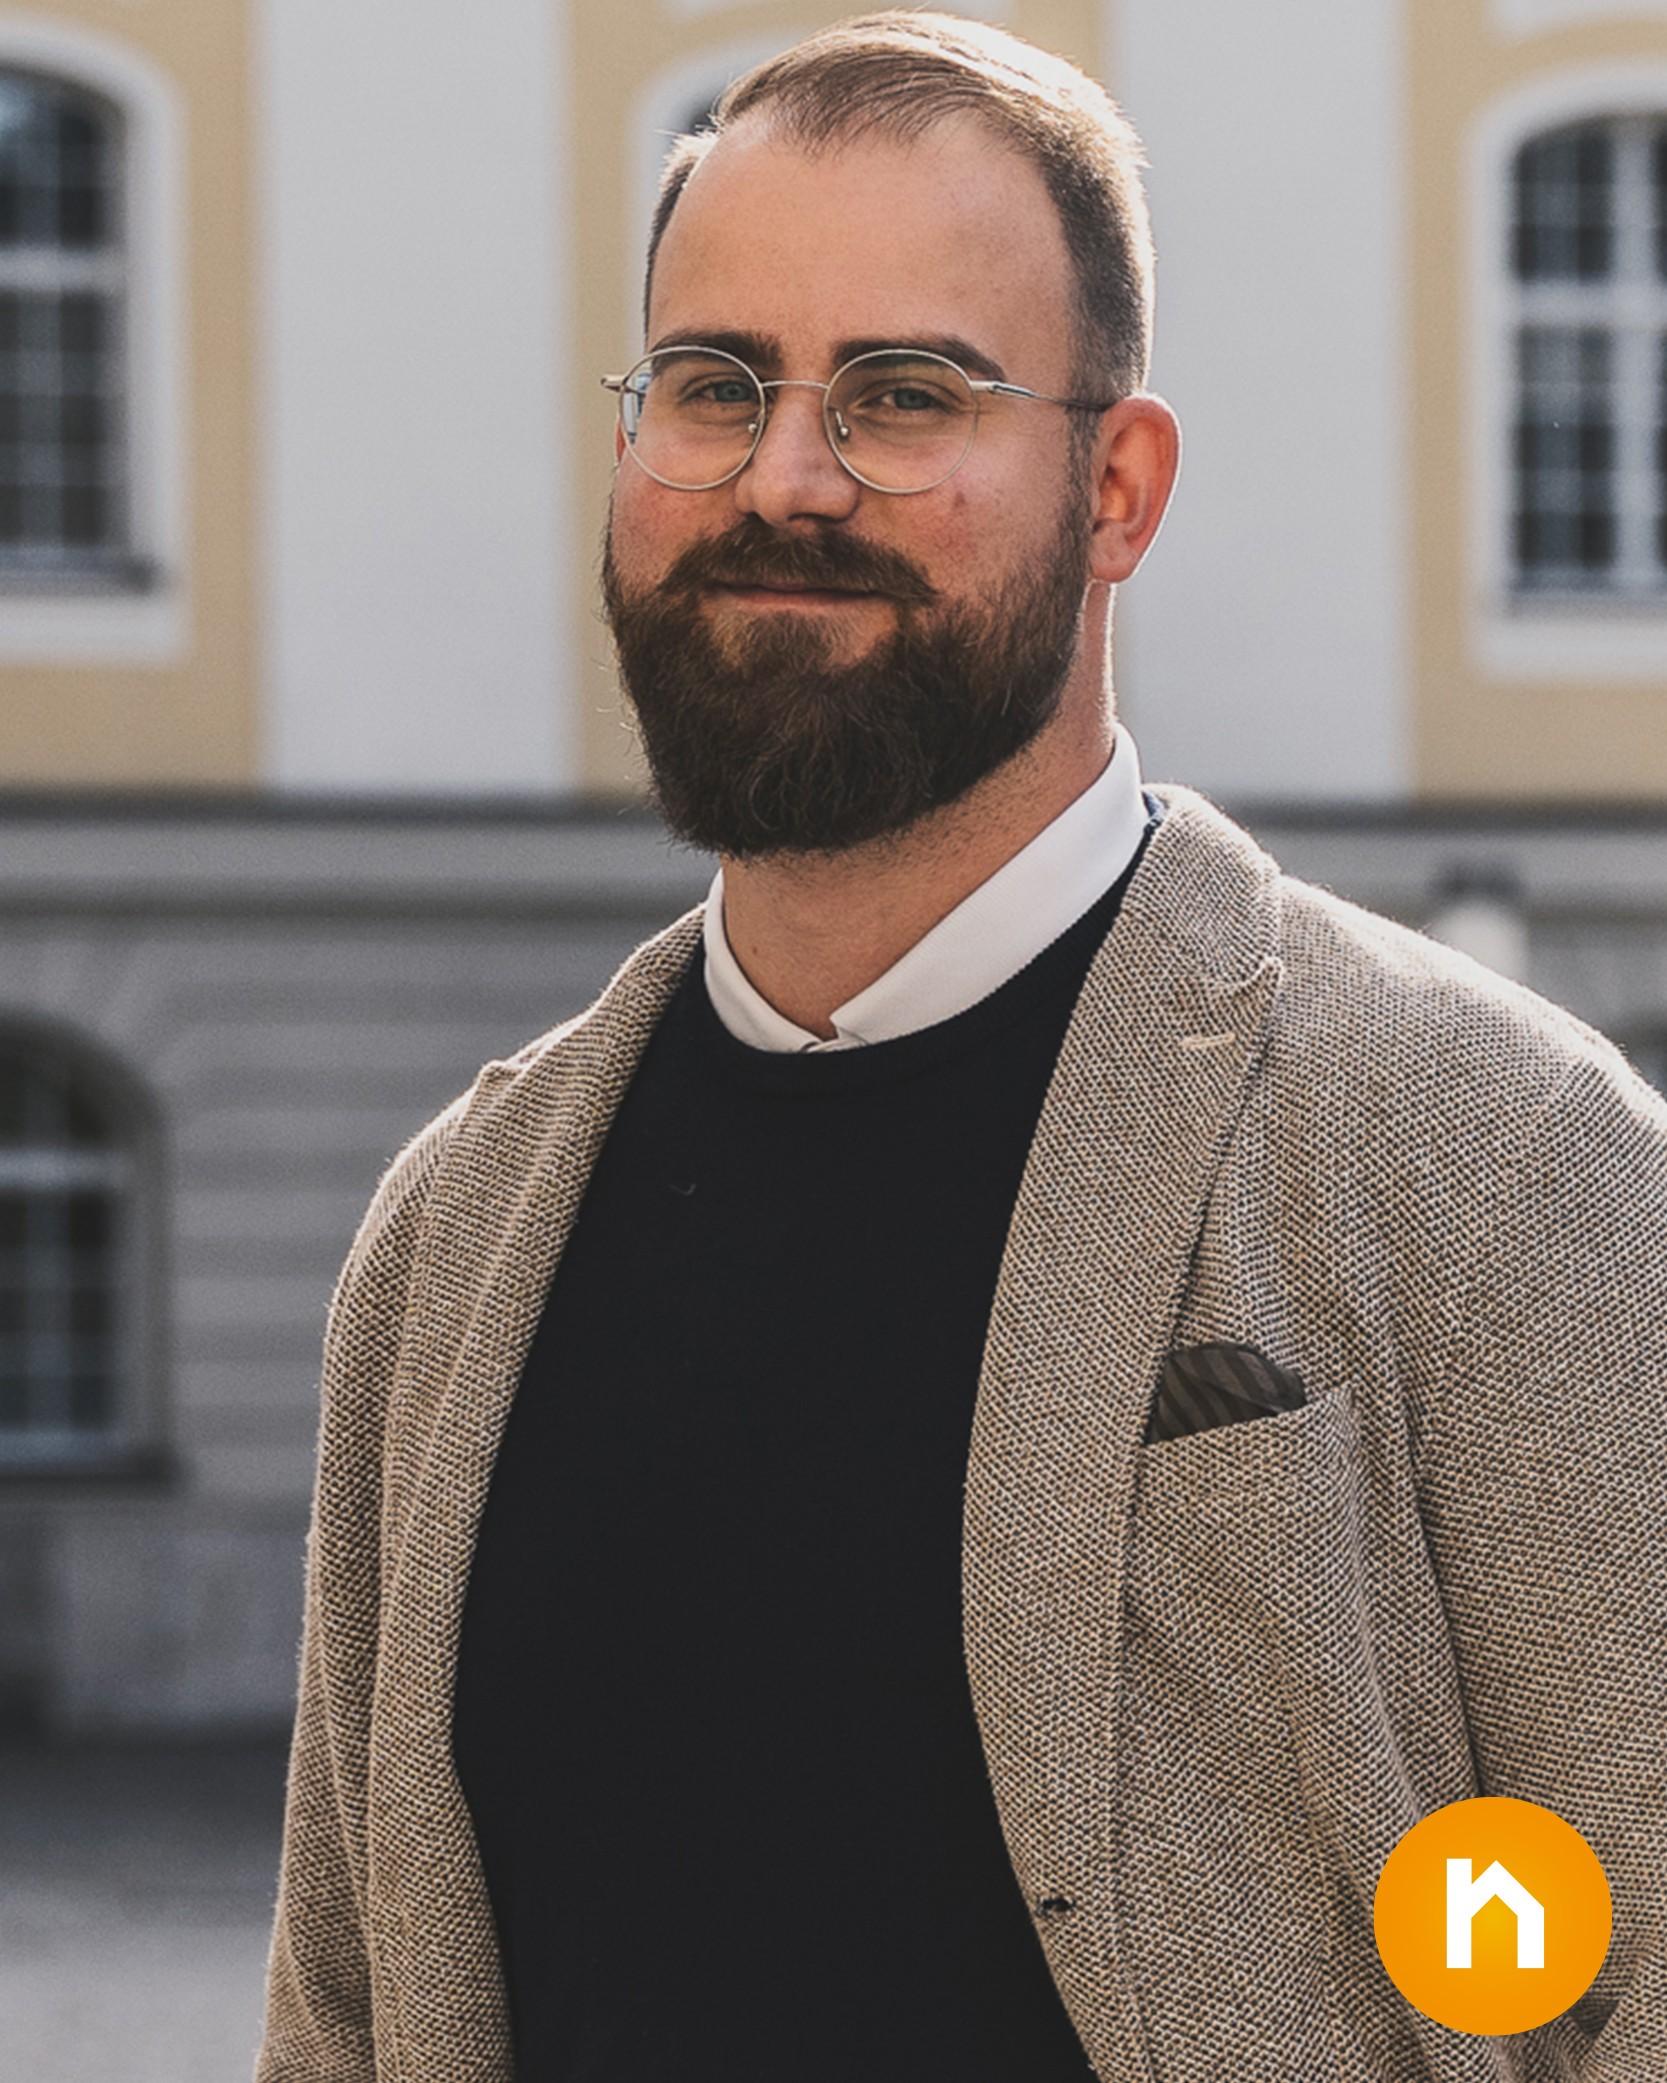 Erol Jasharoski - Leitung Digitalisierung & Marketing